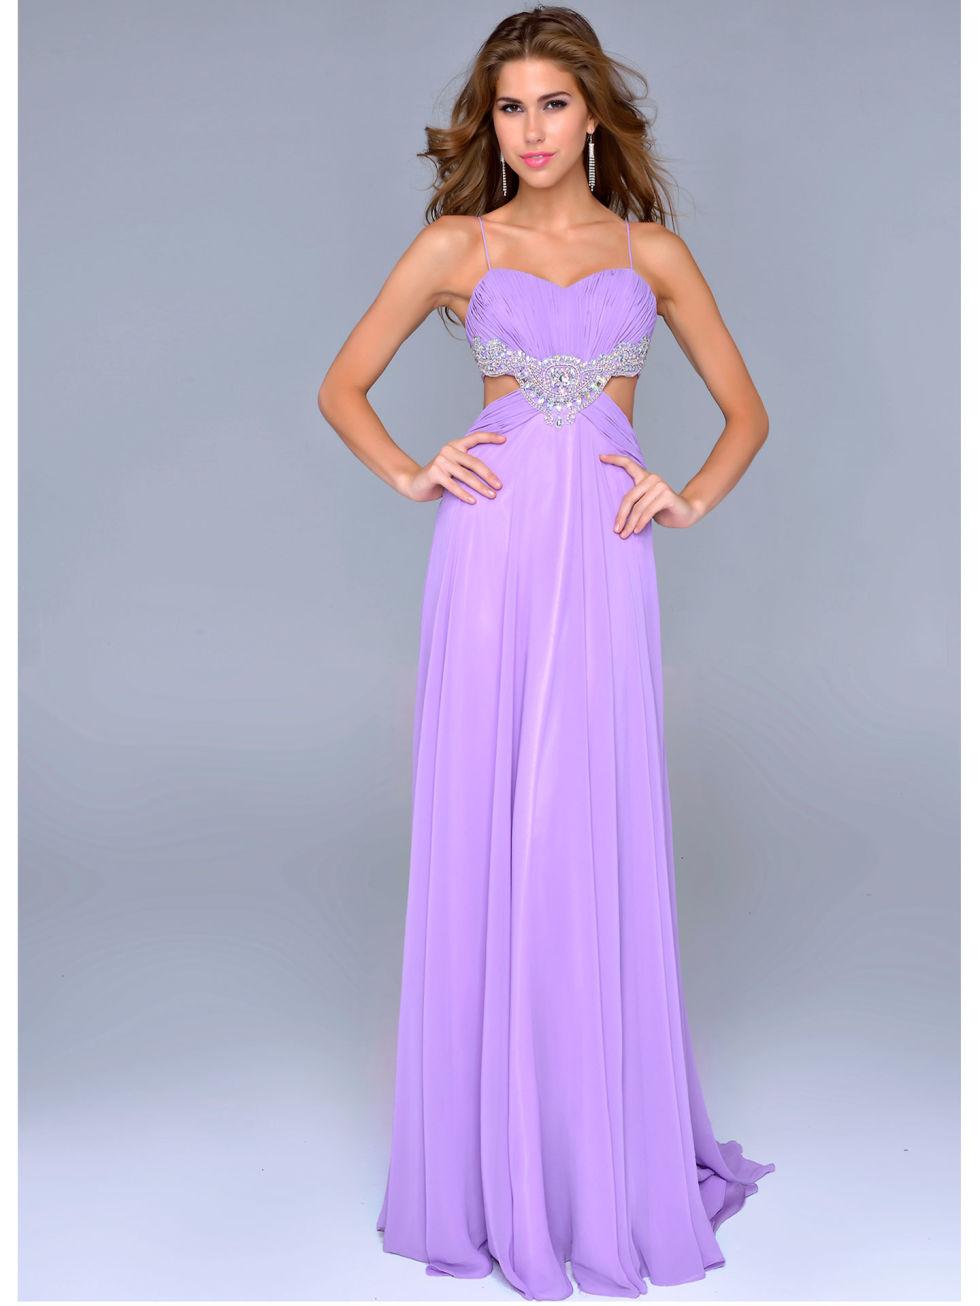 Light Purple Prom Dresses With Sleeves